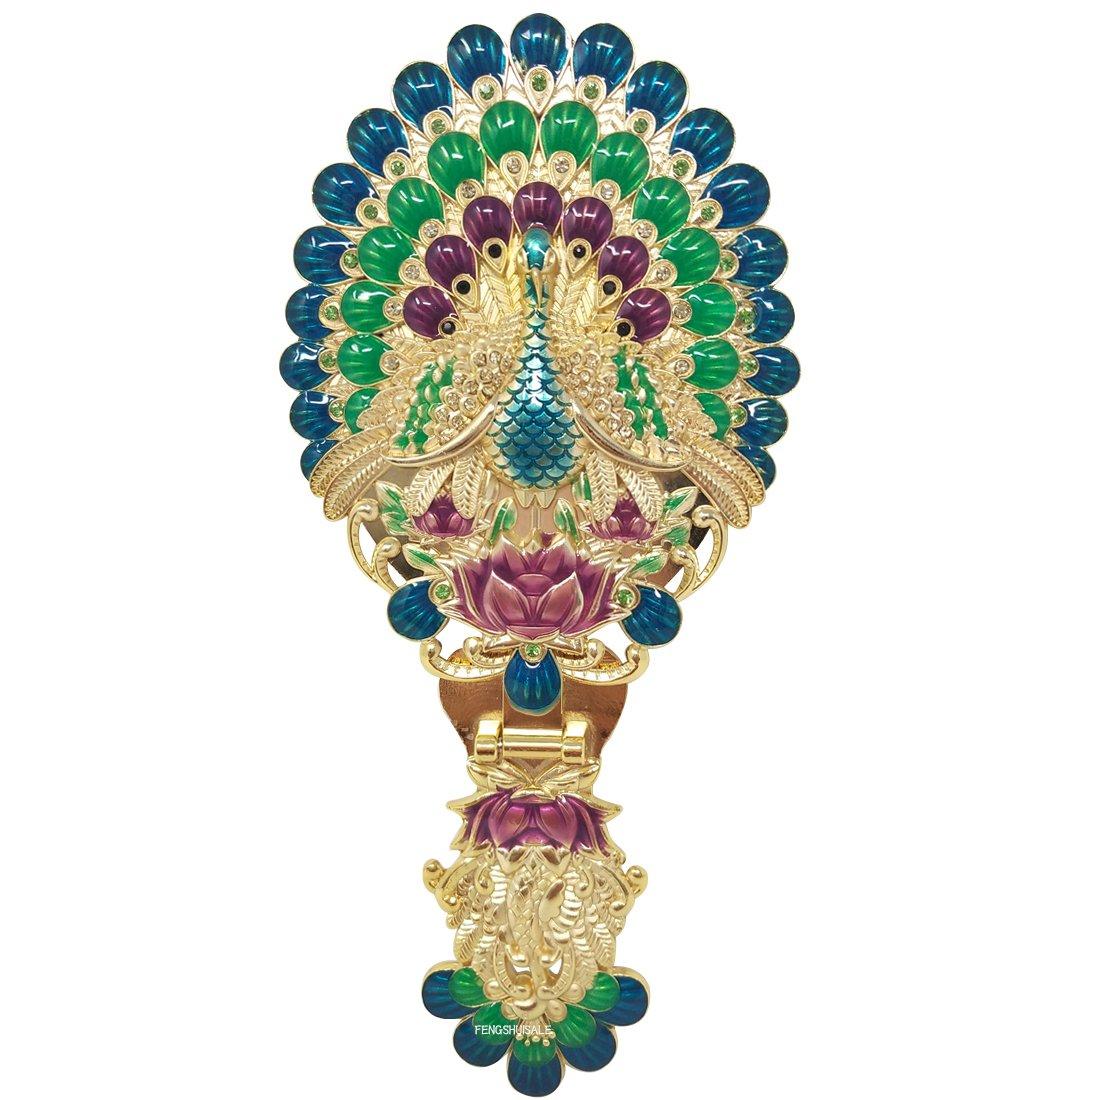 Fengshui Wish-Granting Peacock Mirror W Fengshuisale Red String Bracelet W3330